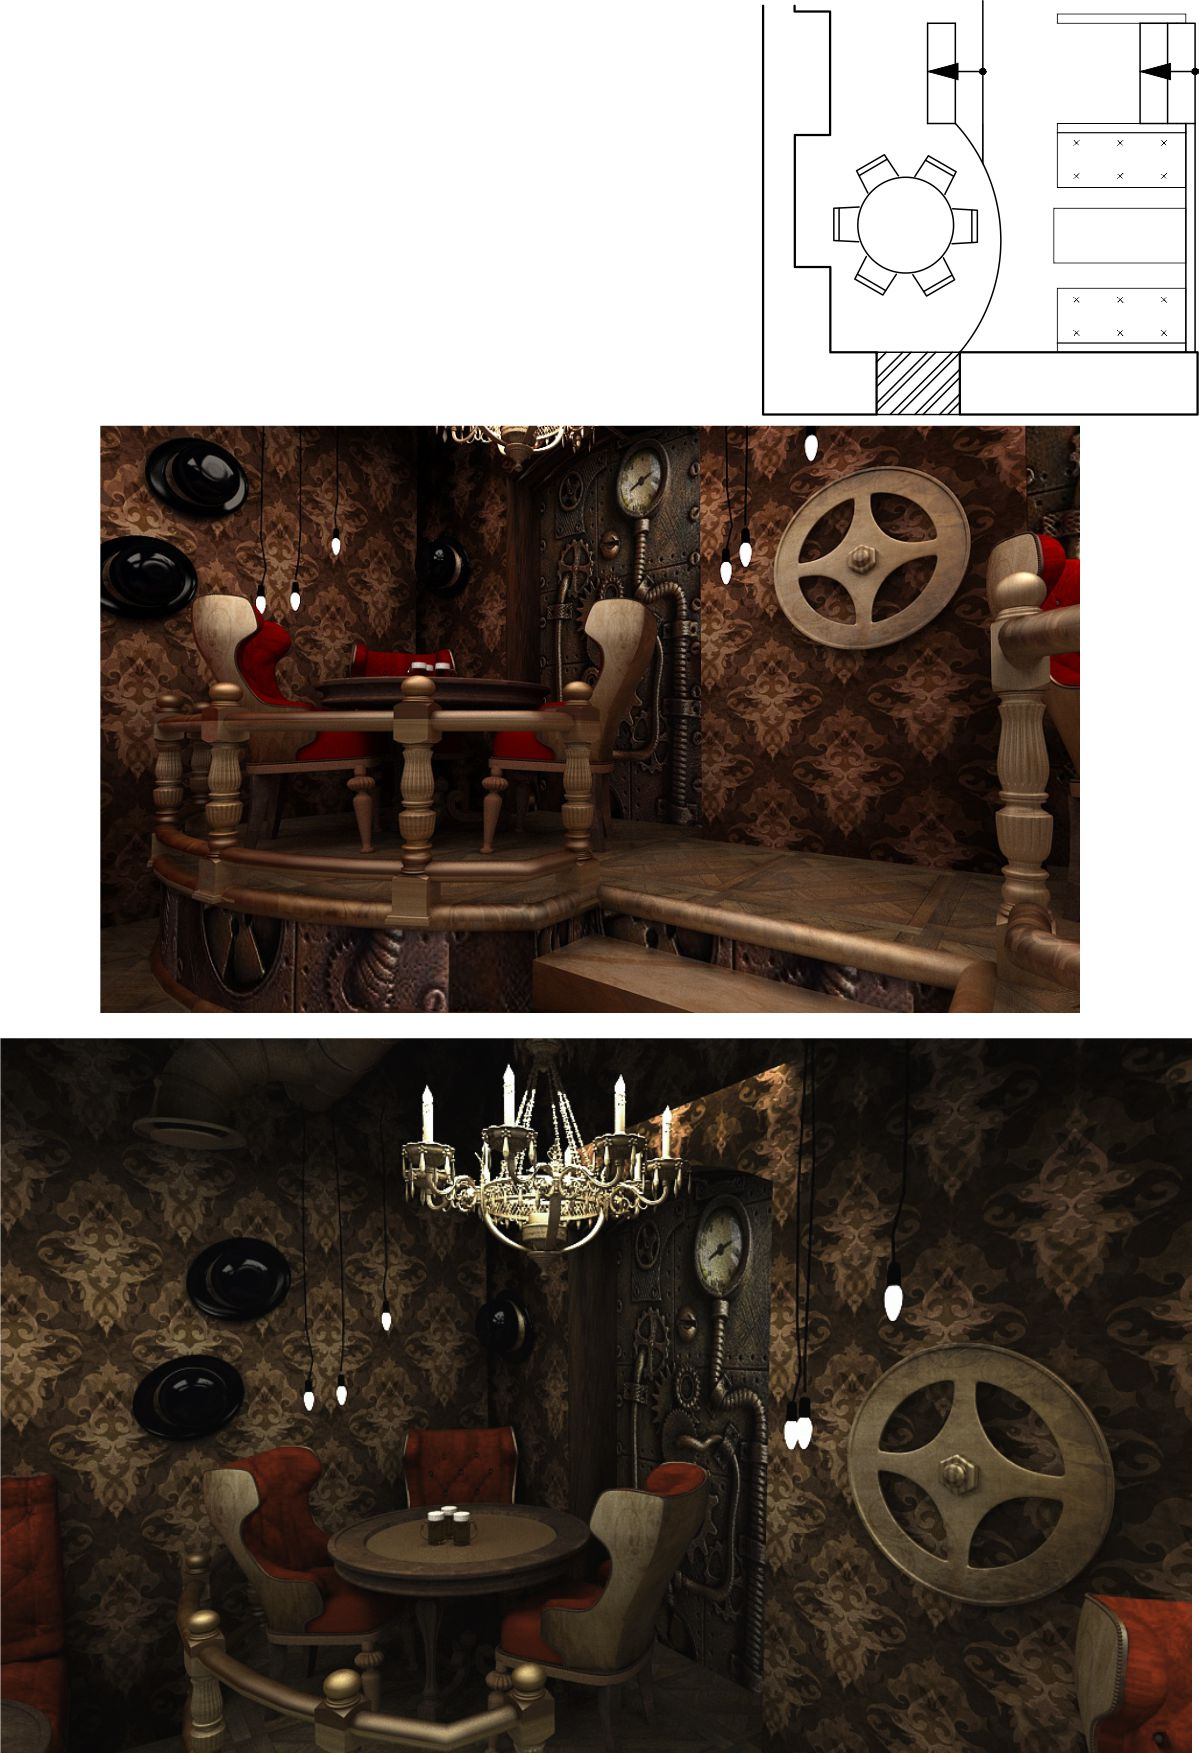 Разработка дизайна помещения под бар фото f_8125946921f94121.jpg